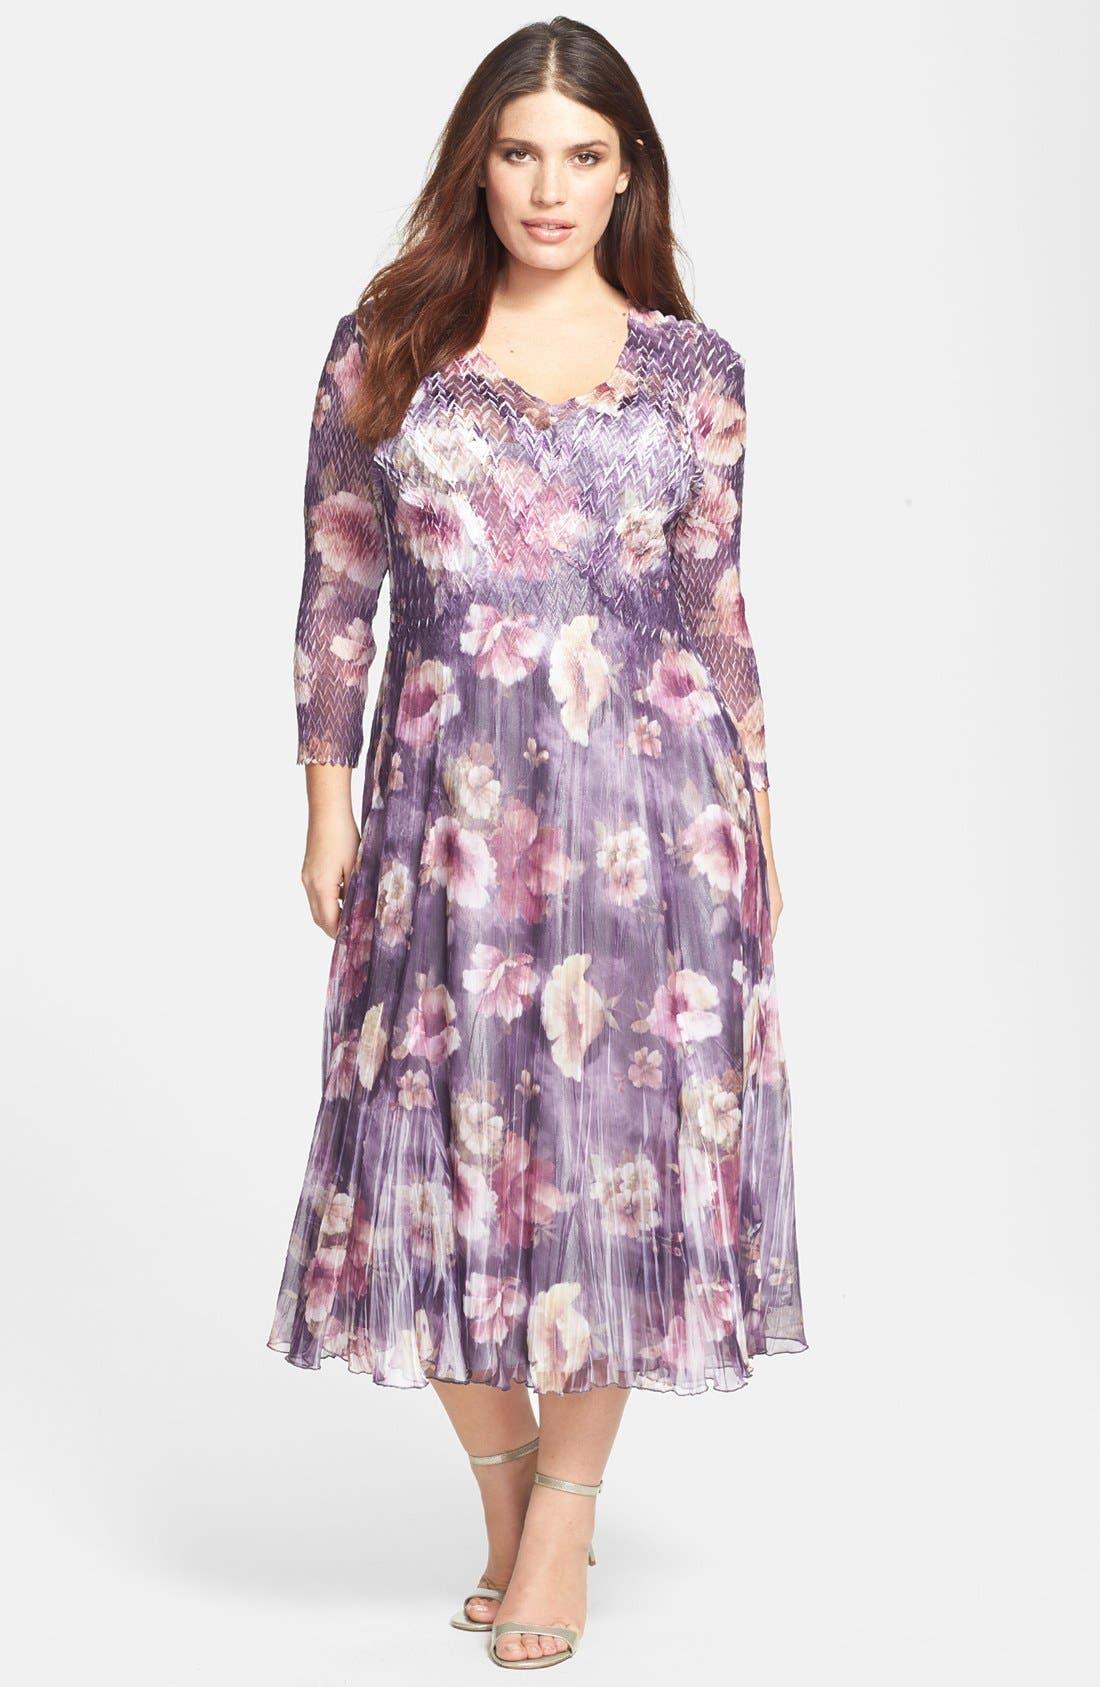 Alternate Image 1 Selected - Komarov Floral Print Charmeuse Dress (Plus Size)